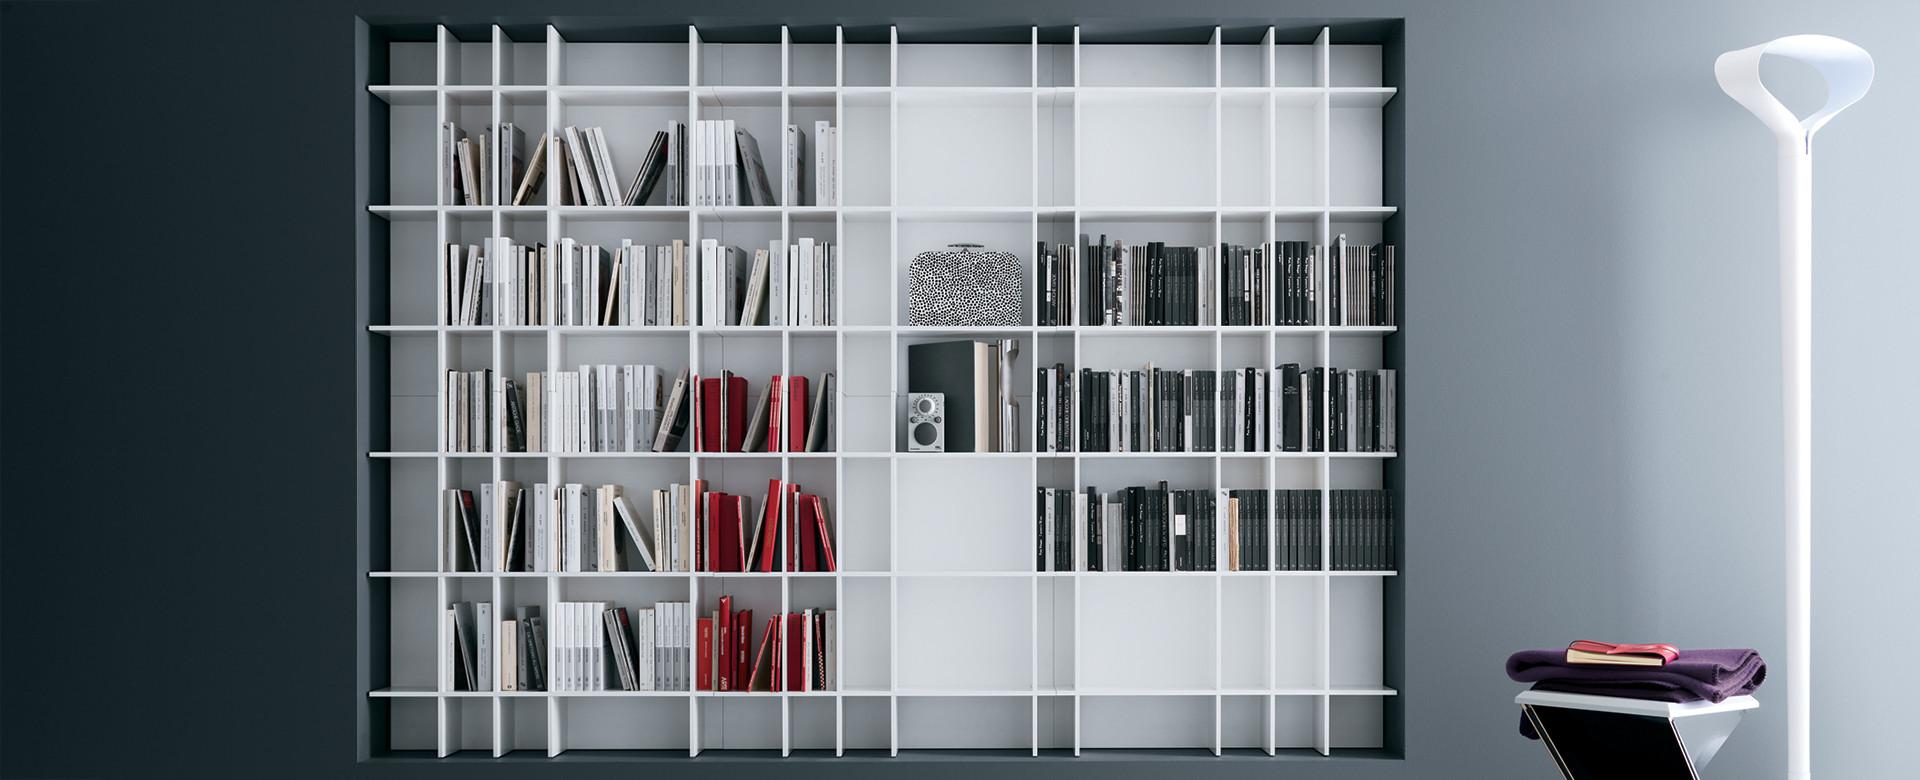 bussolotto novamobili. Black Bedroom Furniture Sets. Home Design Ideas